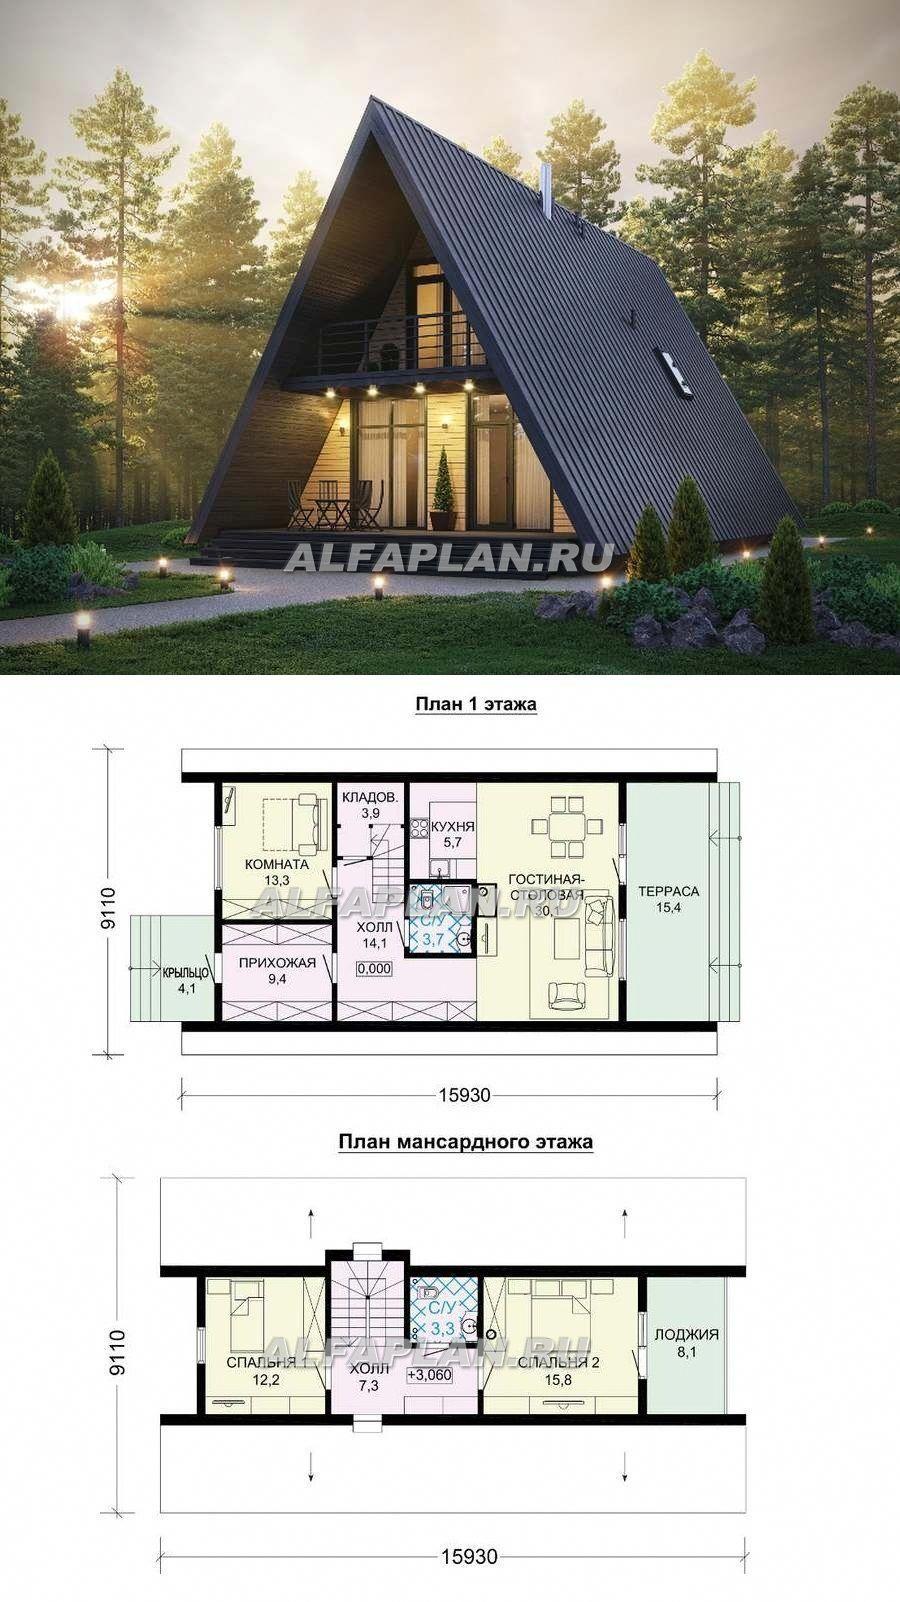 Large Home Floor Plan Ideas Large Home Floor Plan Ideas In 2020 Triangle House A Frame House House Floor Plans